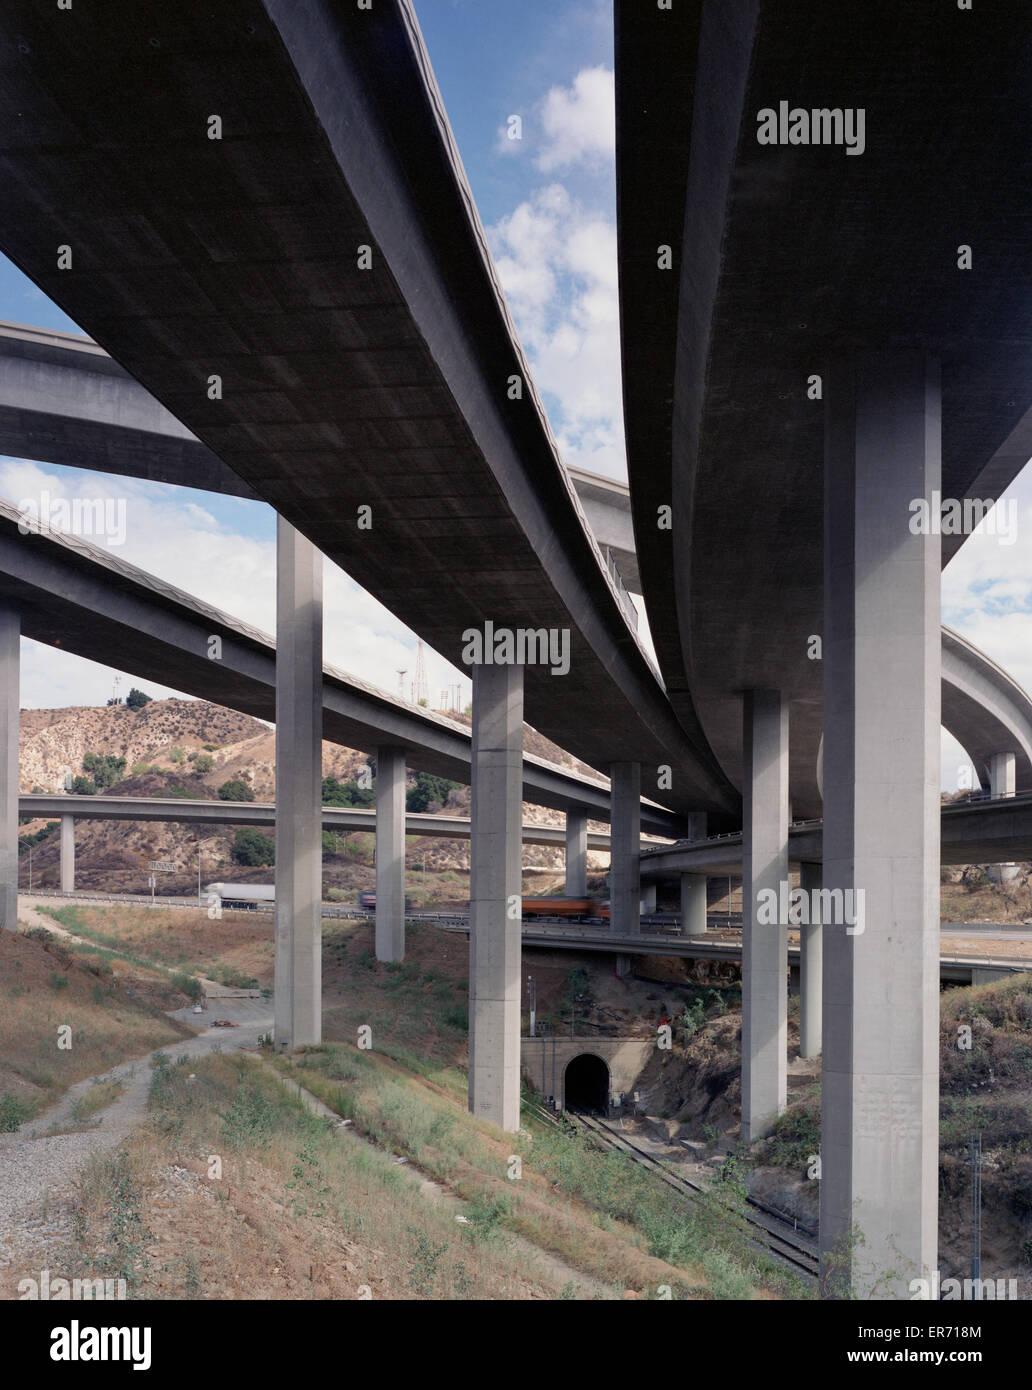 Multi-layered highway overpass - Stock Image